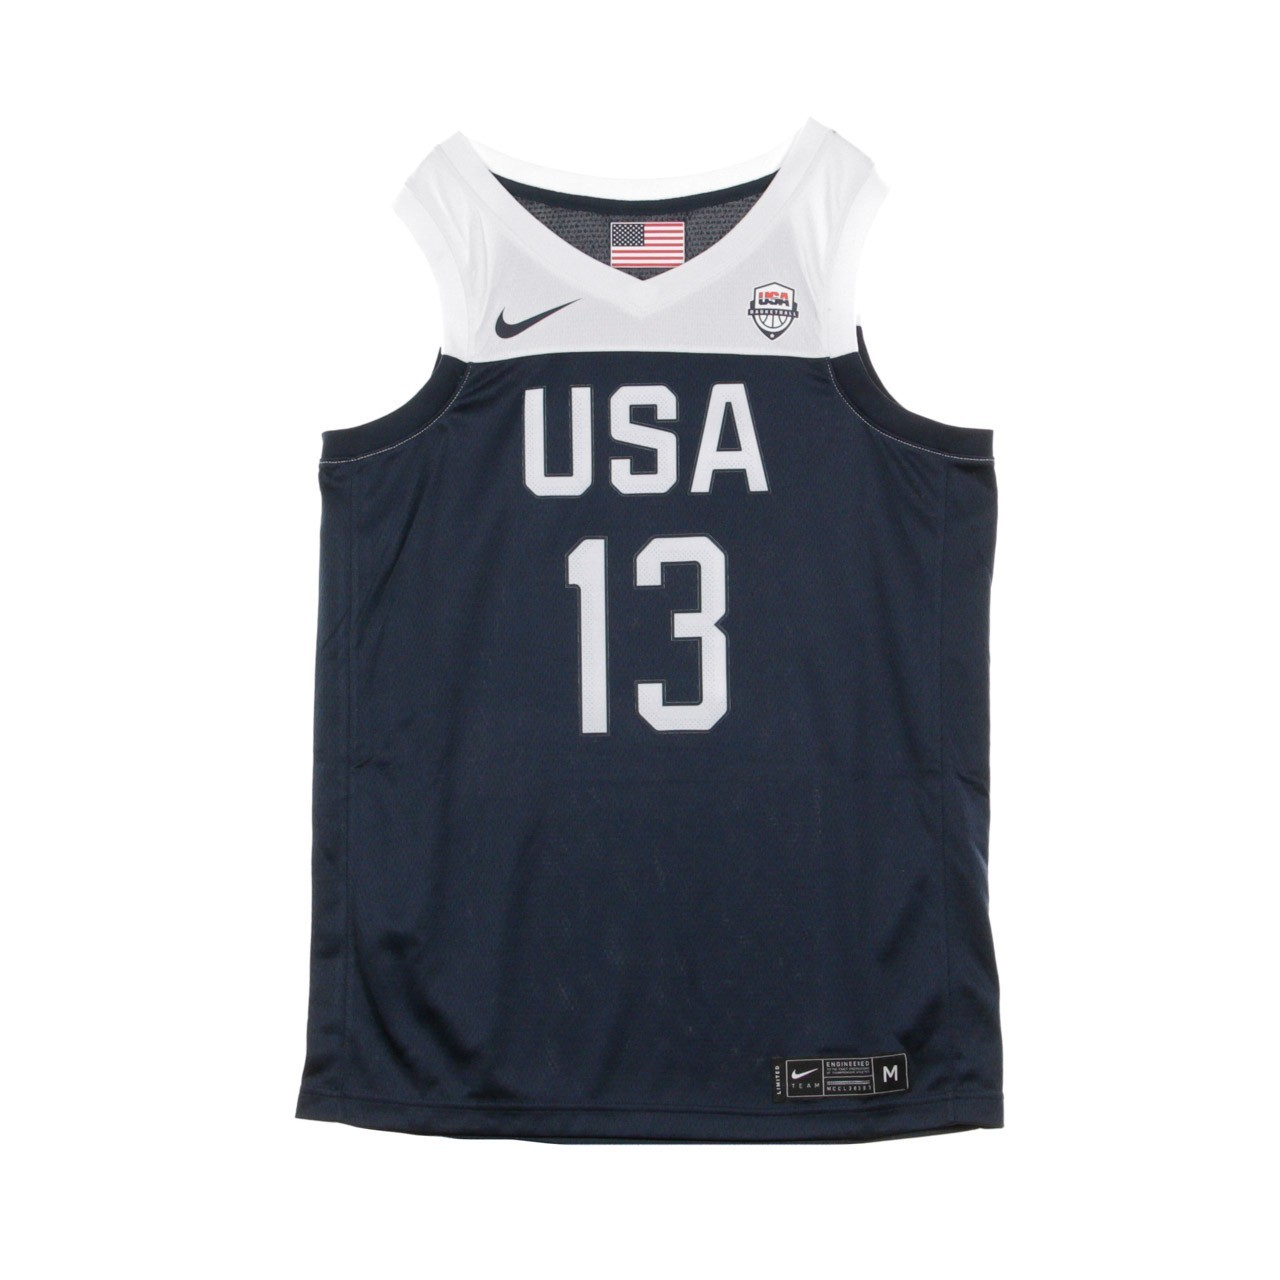 NIKE NBA NBA SWINGMAN JERSEY NO 13 JAMES HARDEN TEAM USA LIMITED ROAD AV3826-454